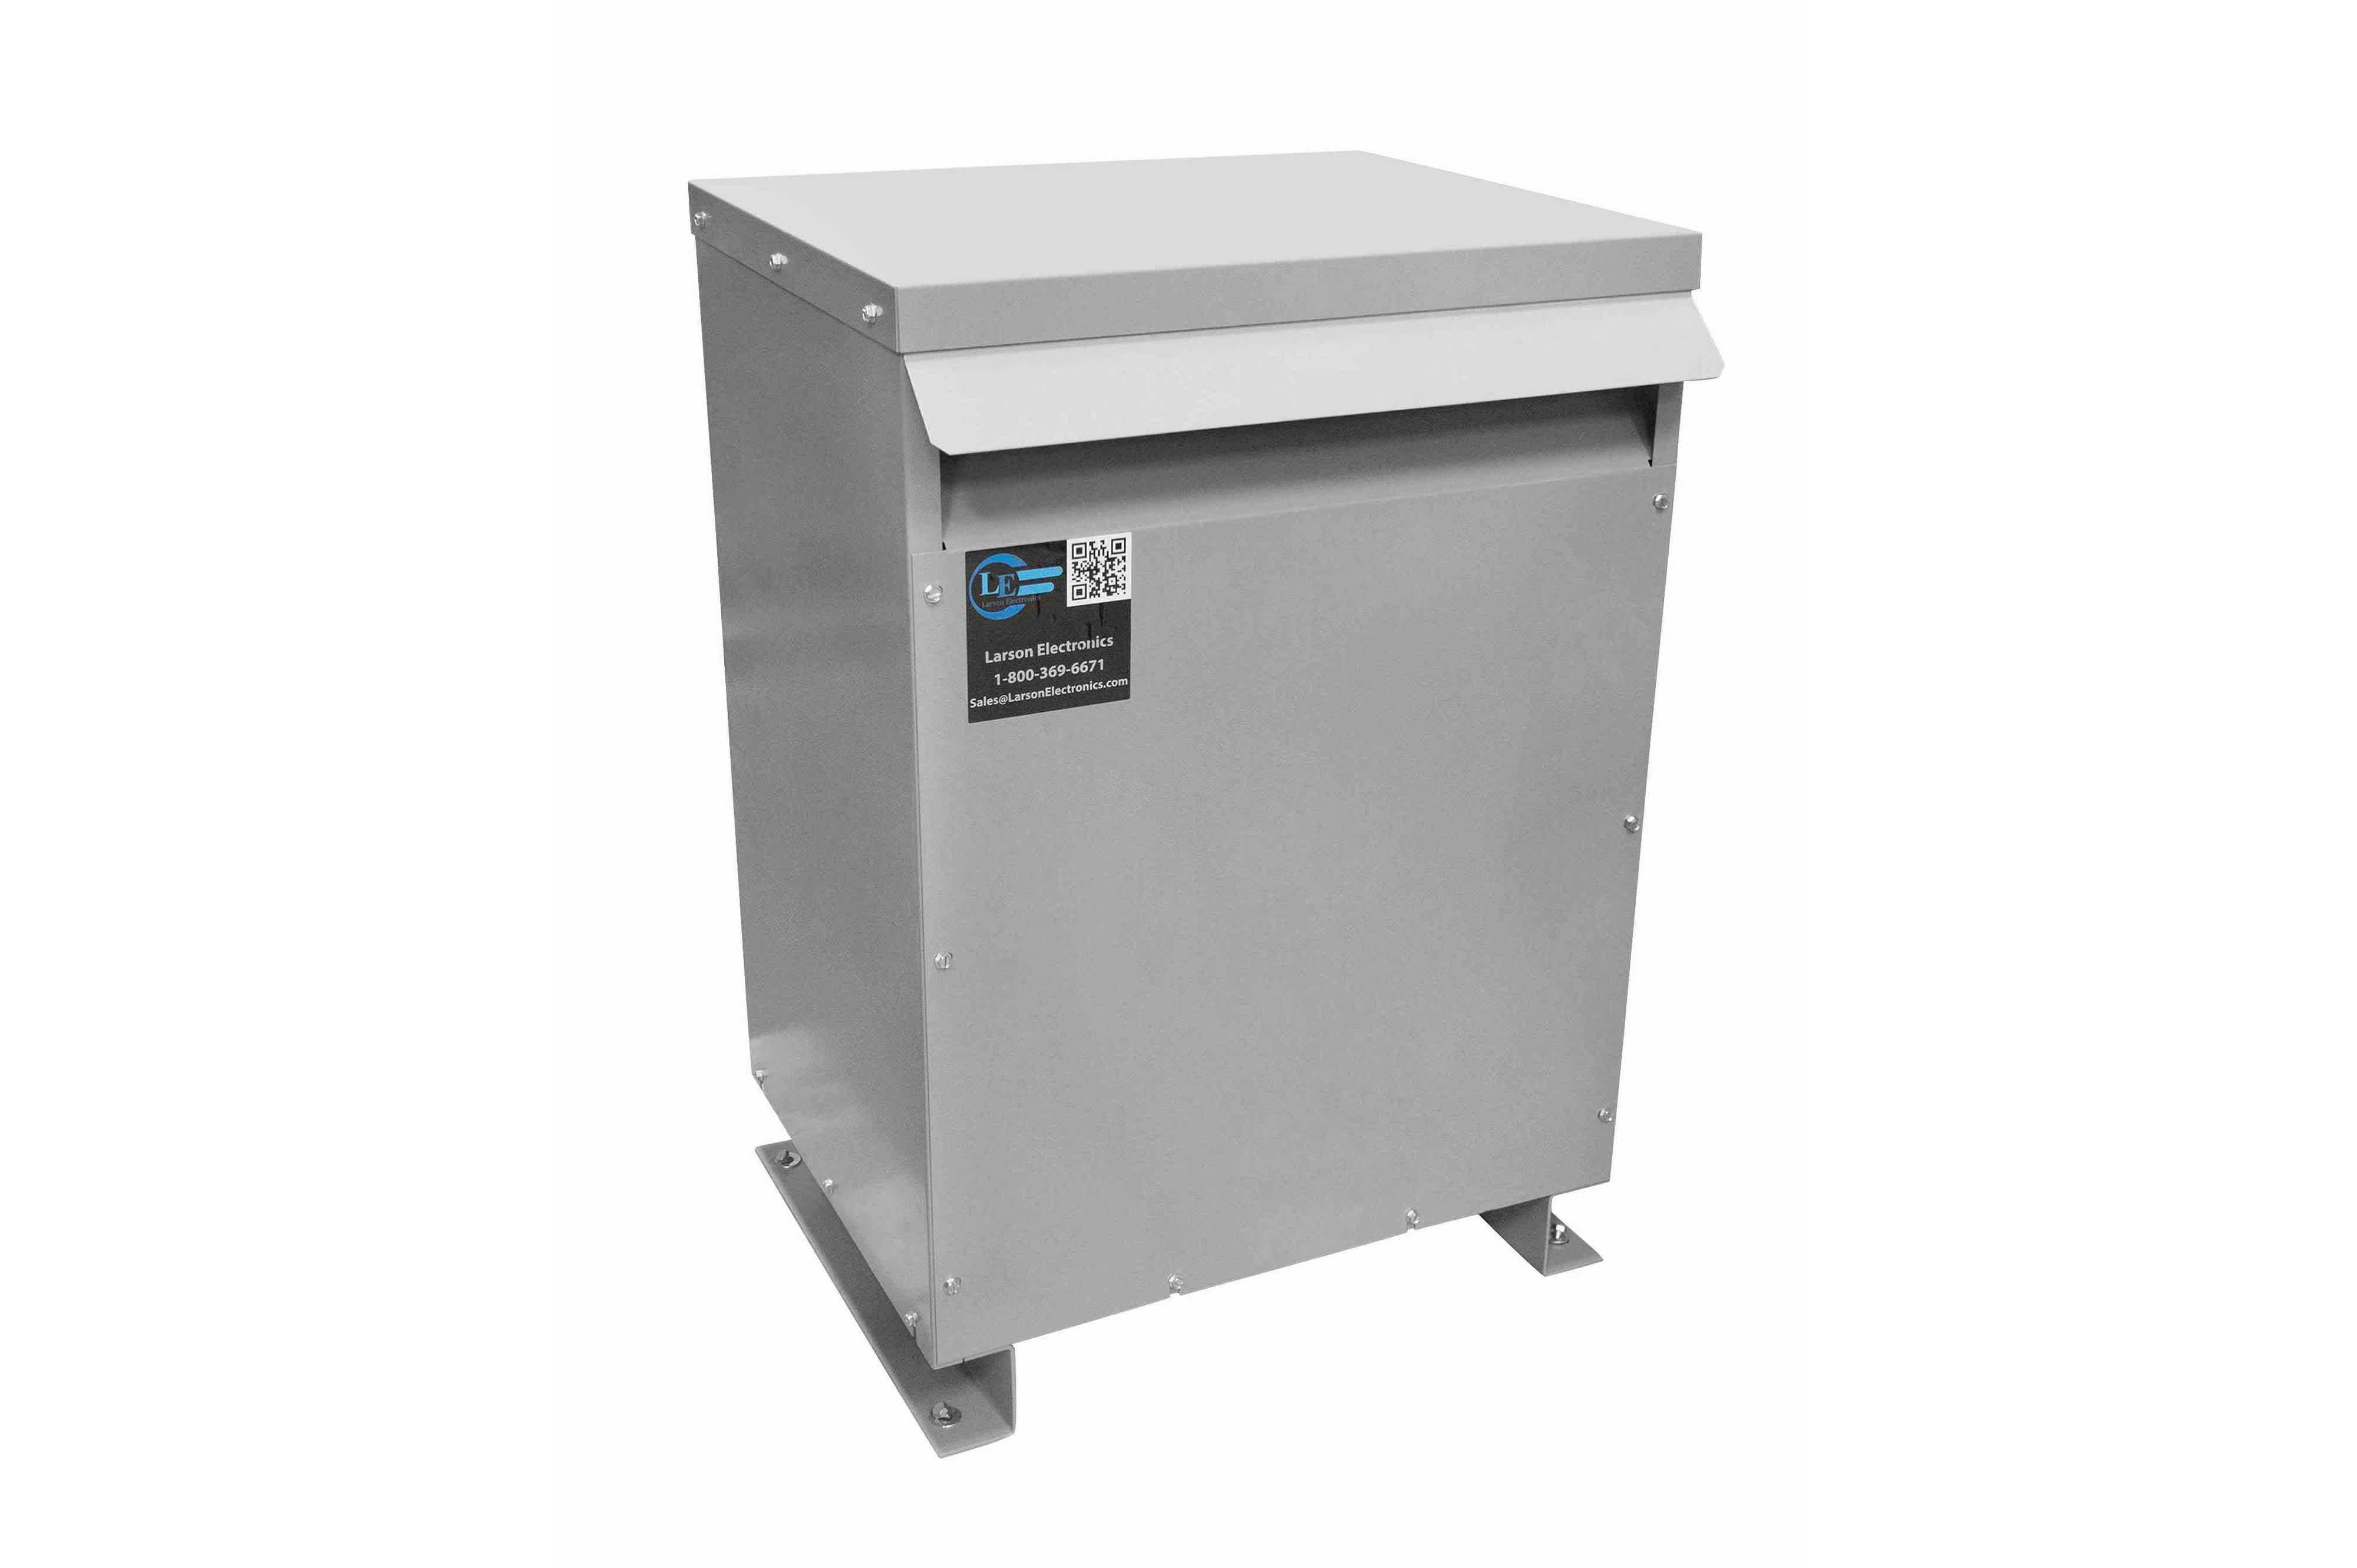 115 kVA 3PH Isolation Transformer, 480V Wye Primary, 575V Delta Secondary, N3R, Ventilated, 60 Hz